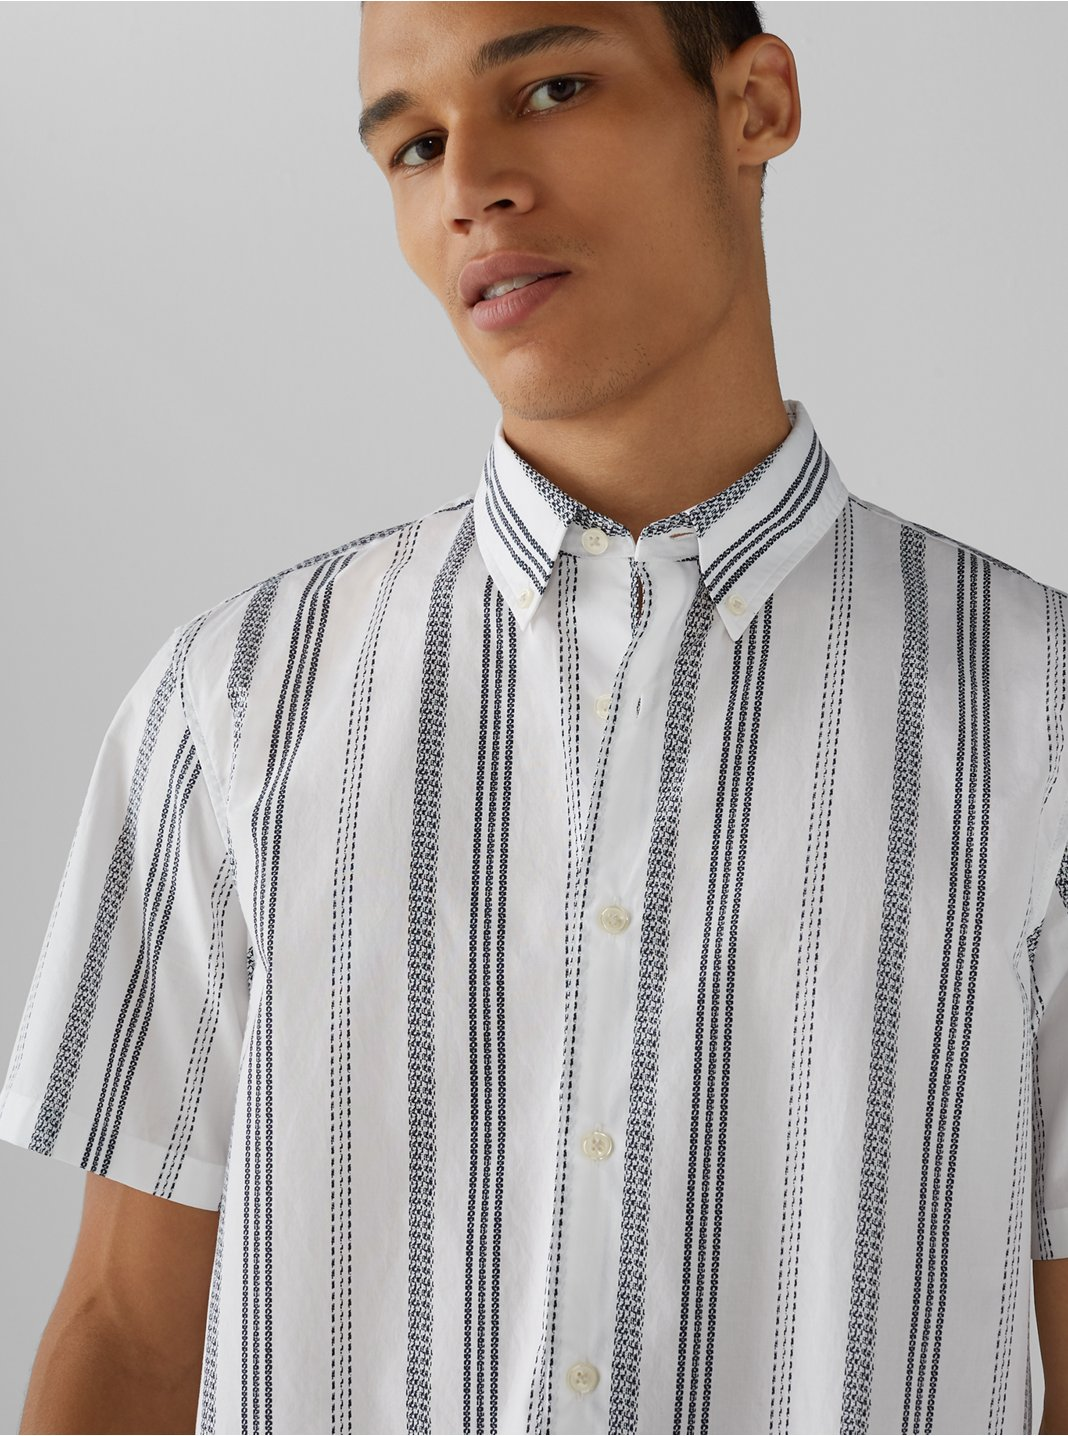 Short Sleeve Loom Striped Shirt